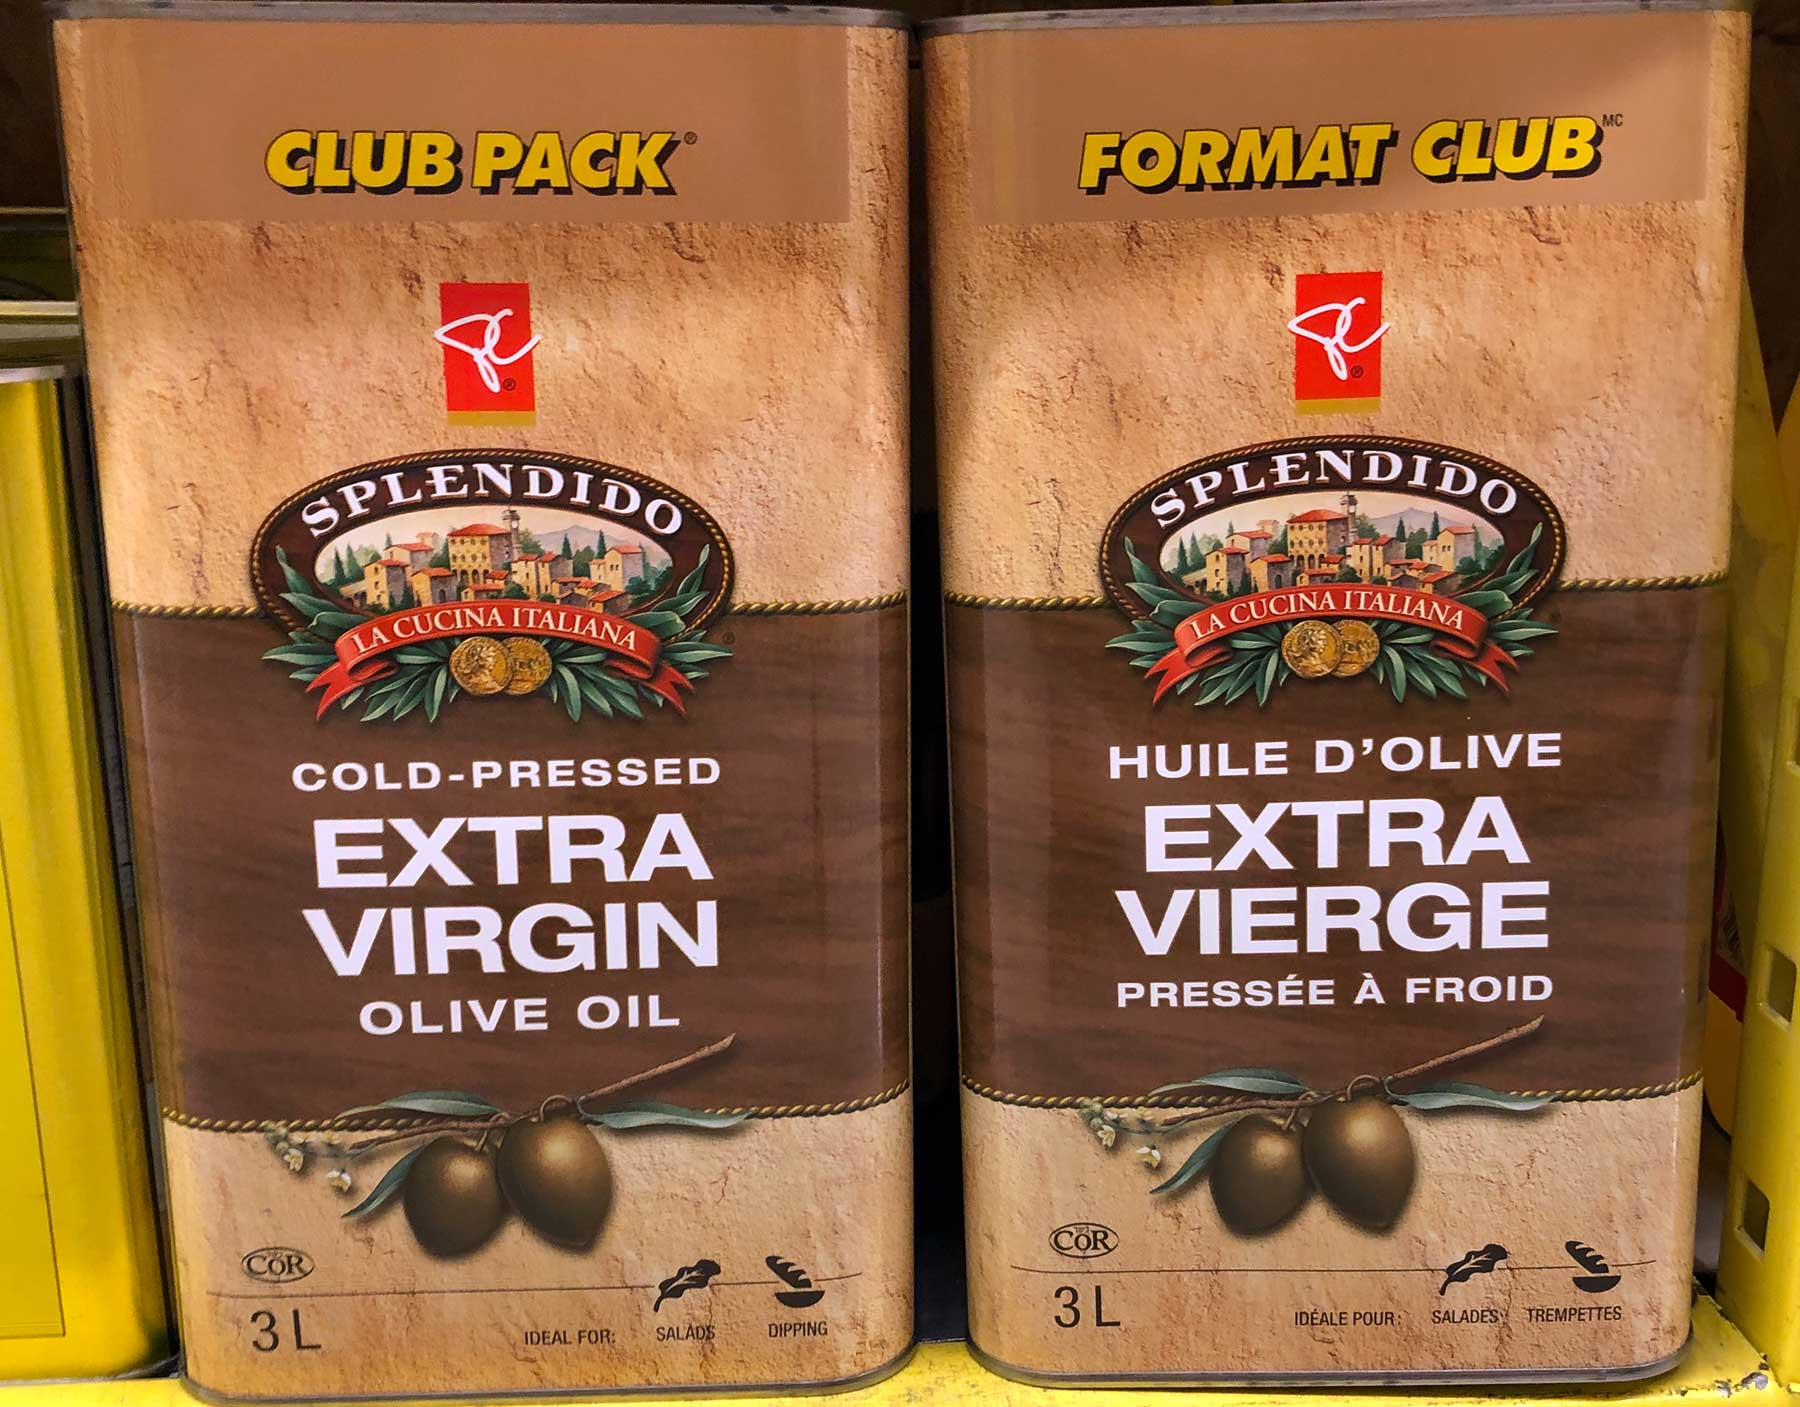 Cold-pressed olive oil.